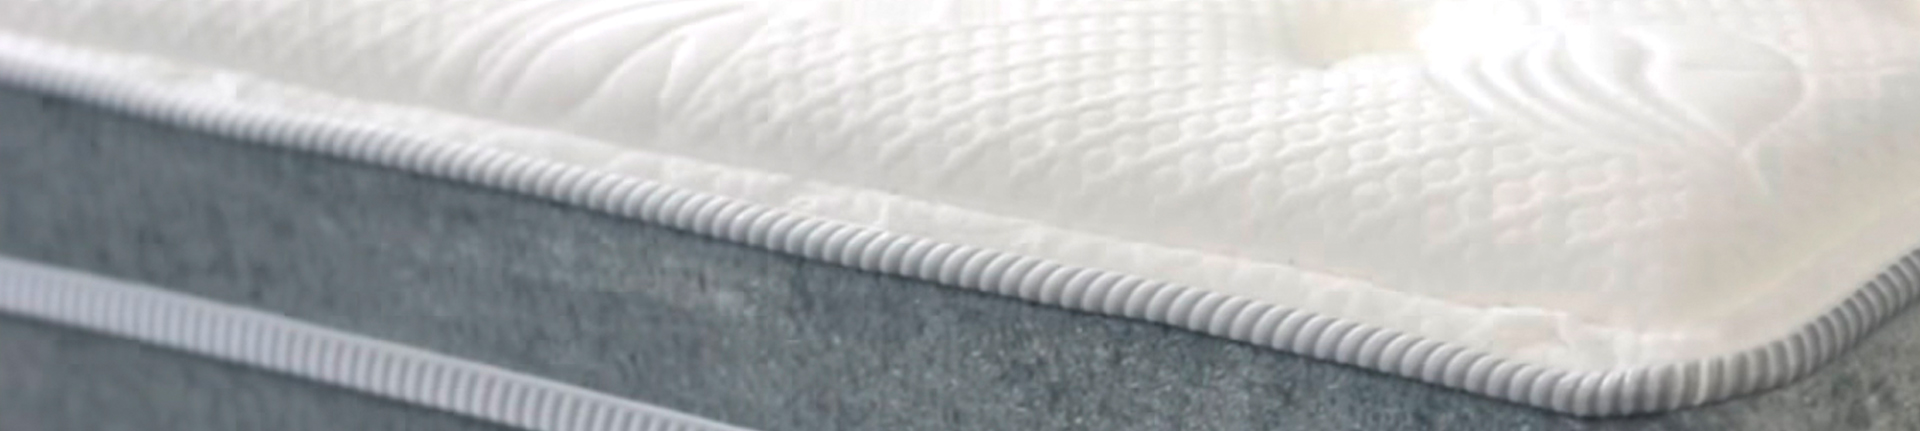 Tecnologia das molas ensacadas – saiba mais